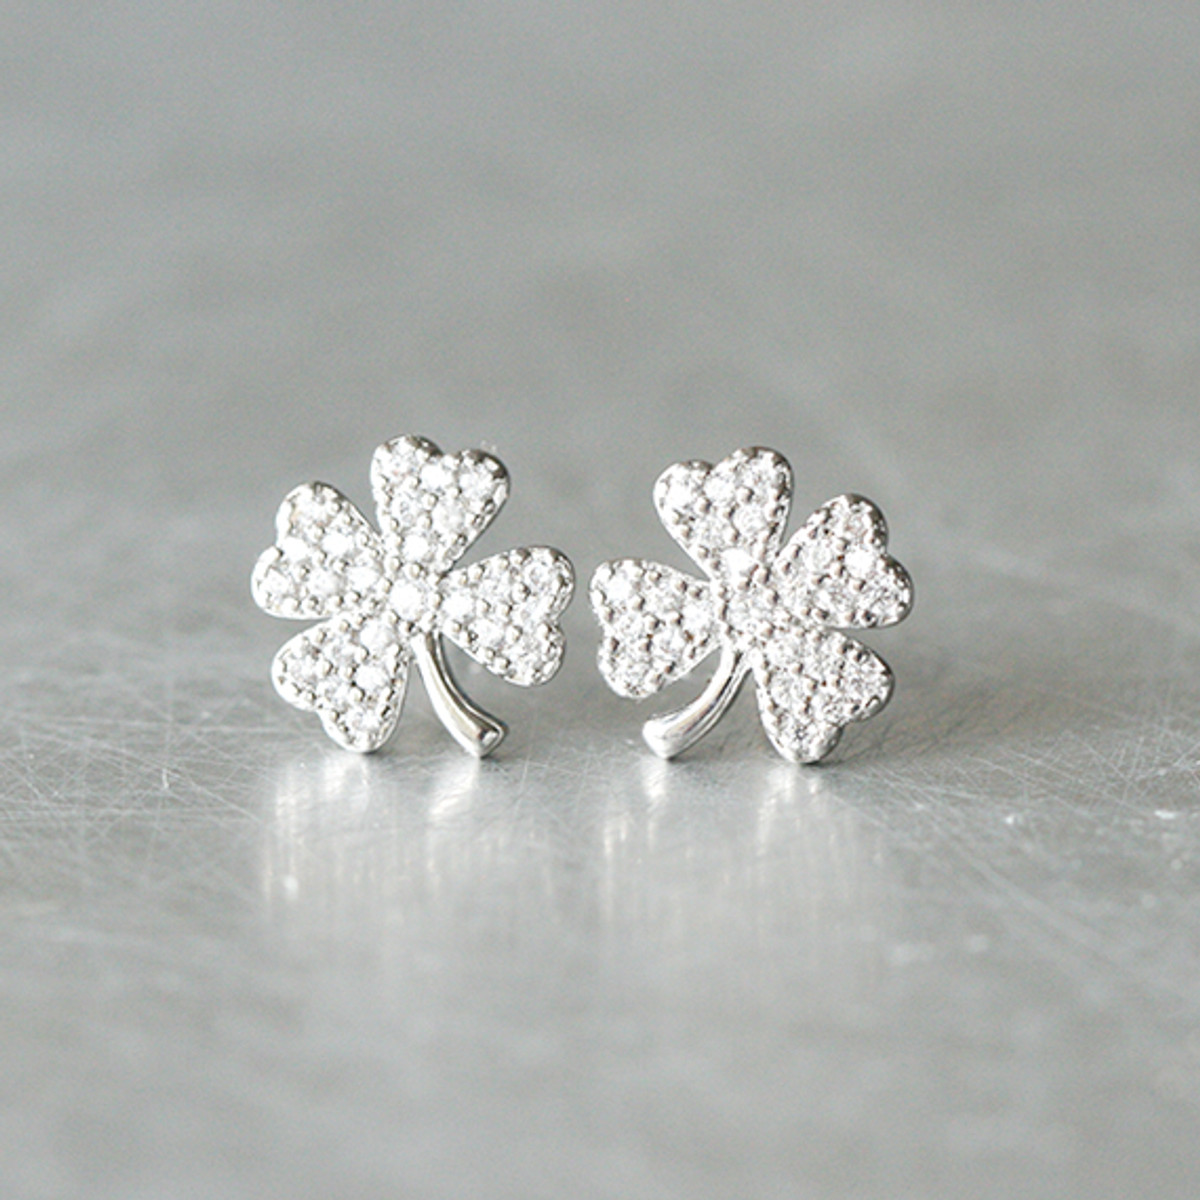 72c7ec6bca9df White Gold CZ Four Leaf Clover Earrings Sterling Silver